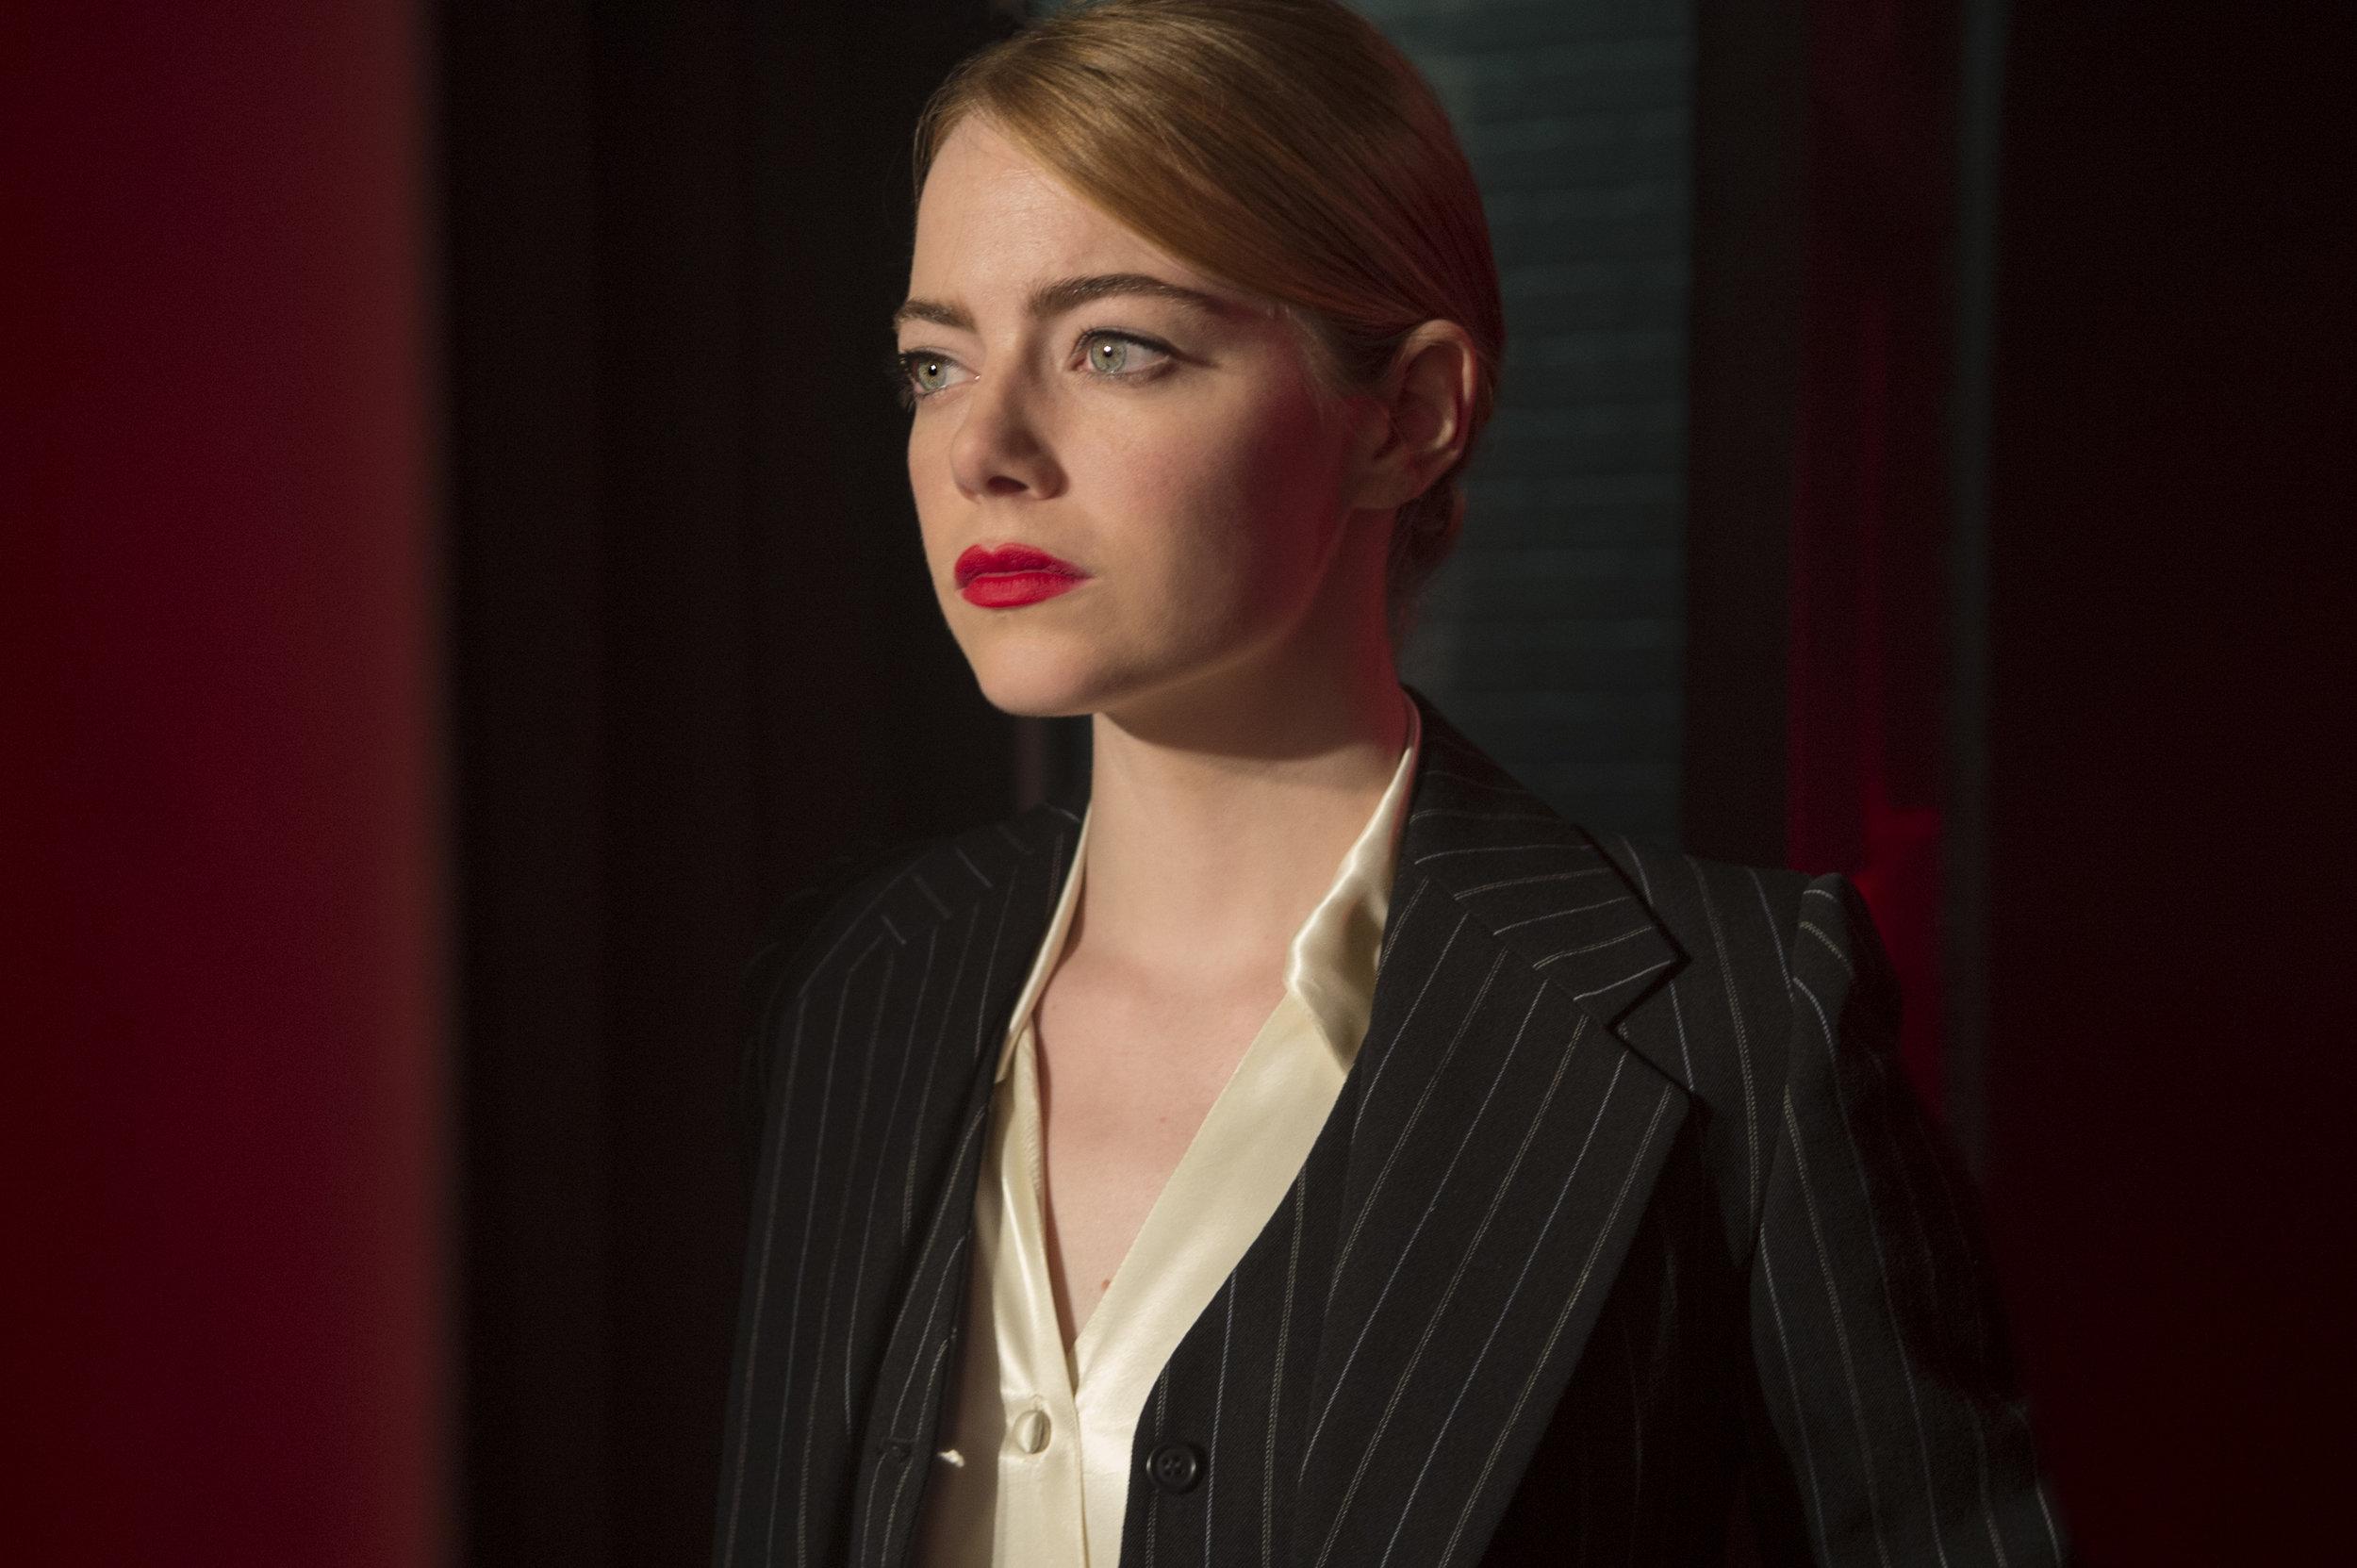 'La La Land' cements frontrunner status with 12 BFCA nominations